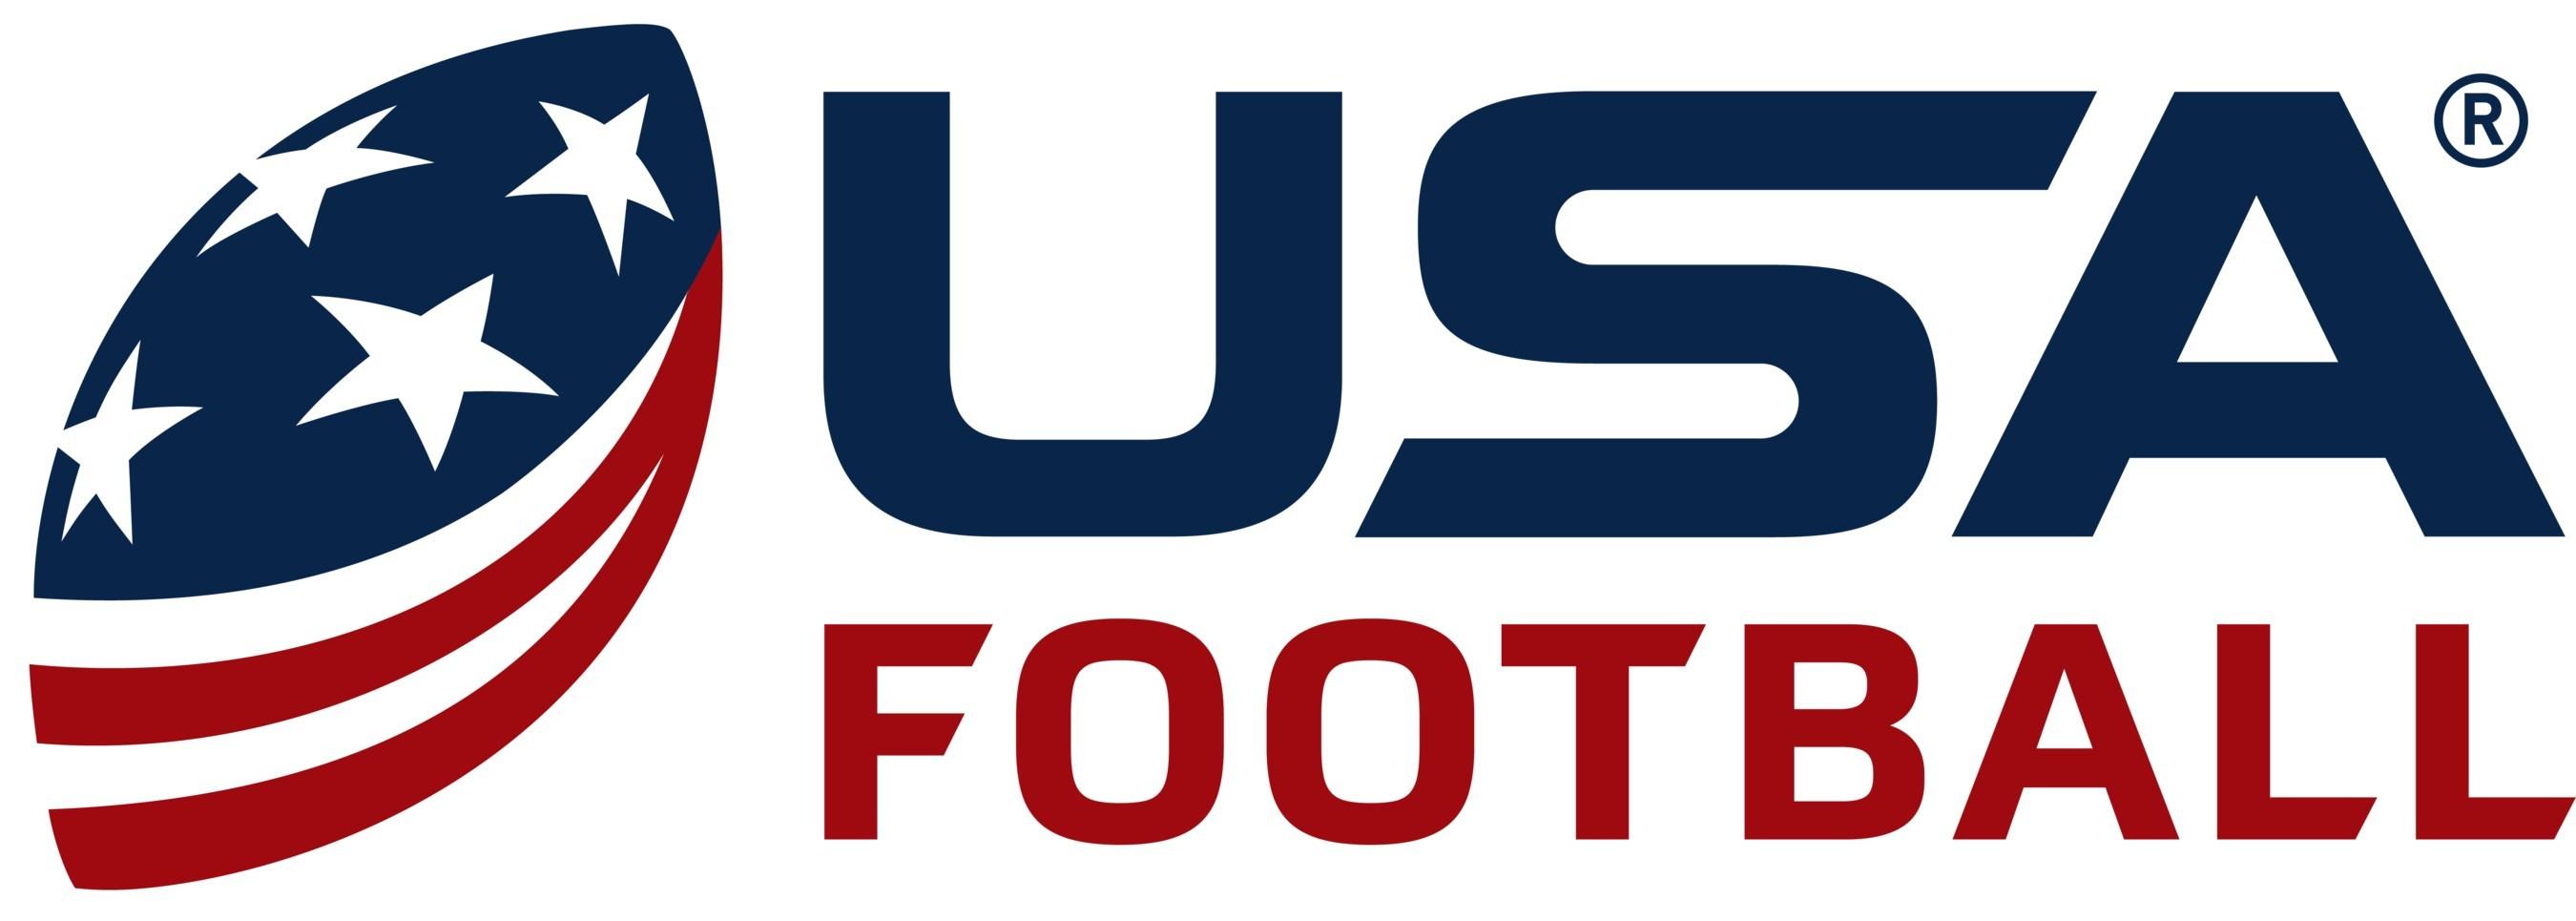 Official USAFB logo. (PRNewsfoto/USA Football)